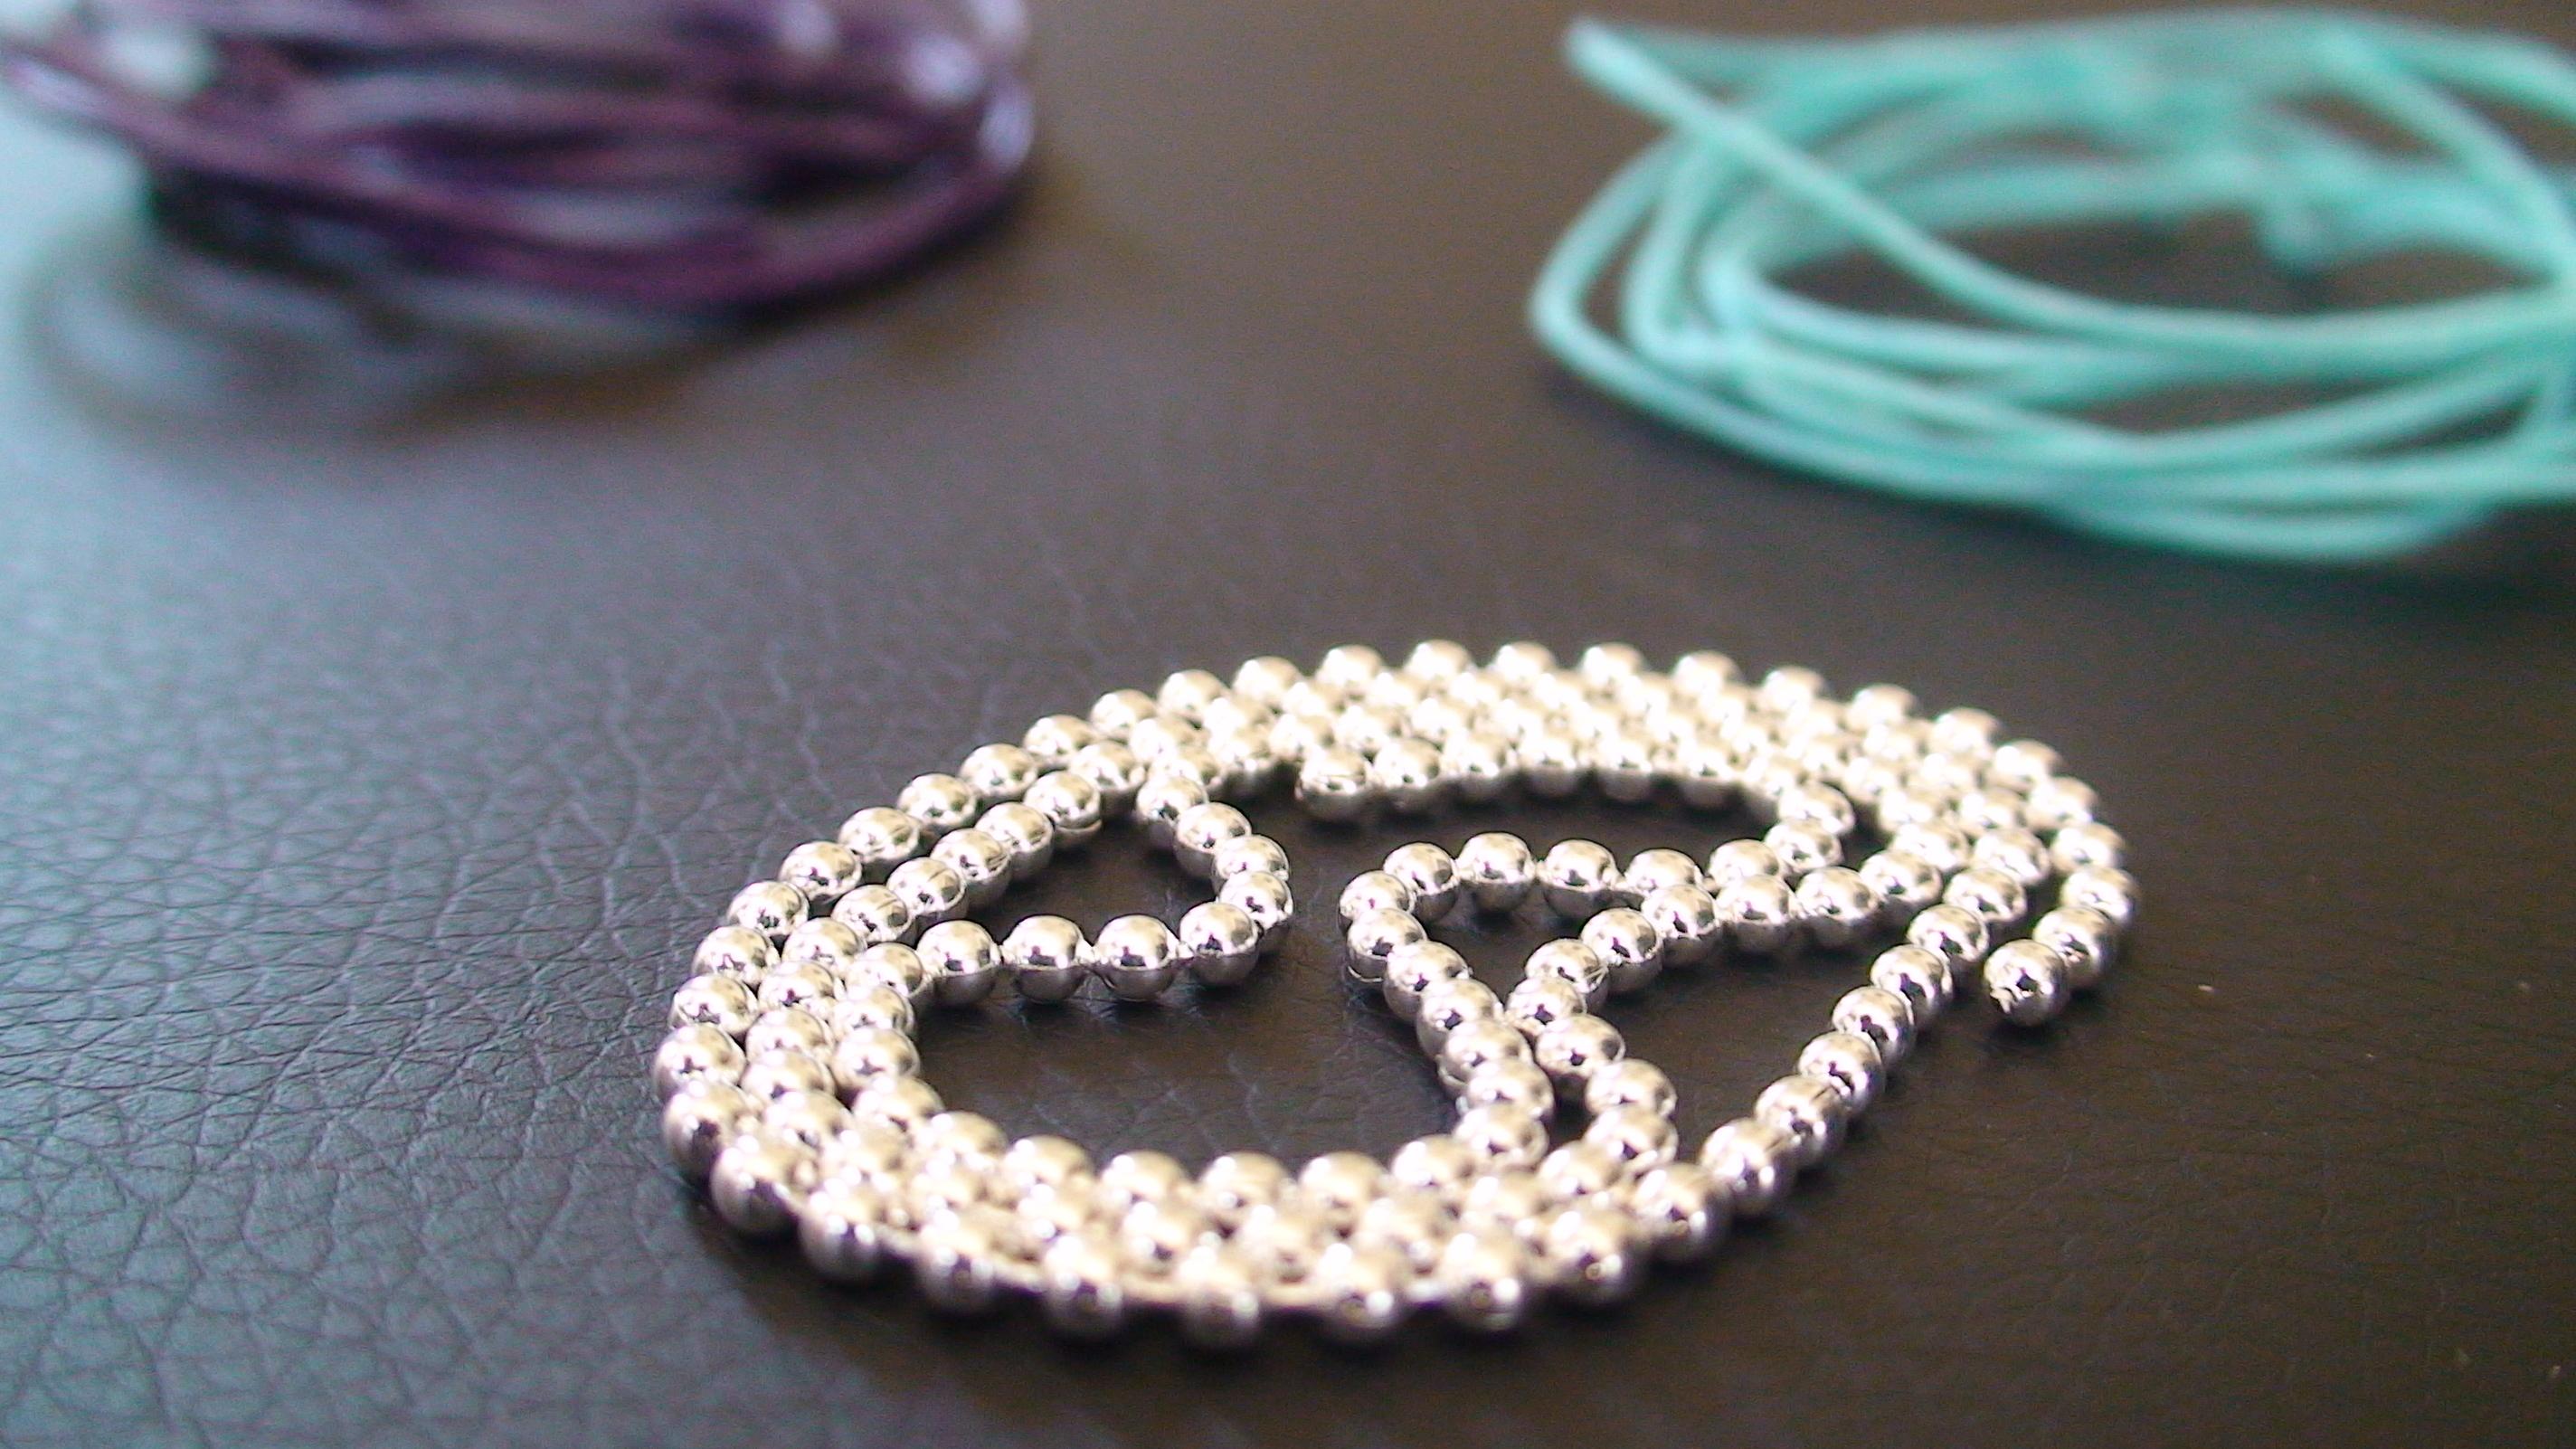 tuto bracelet cuir free tuto bracelet cuir with tuto bracelet cuir kit tuto bracelet cuir. Black Bedroom Furniture Sets. Home Design Ideas